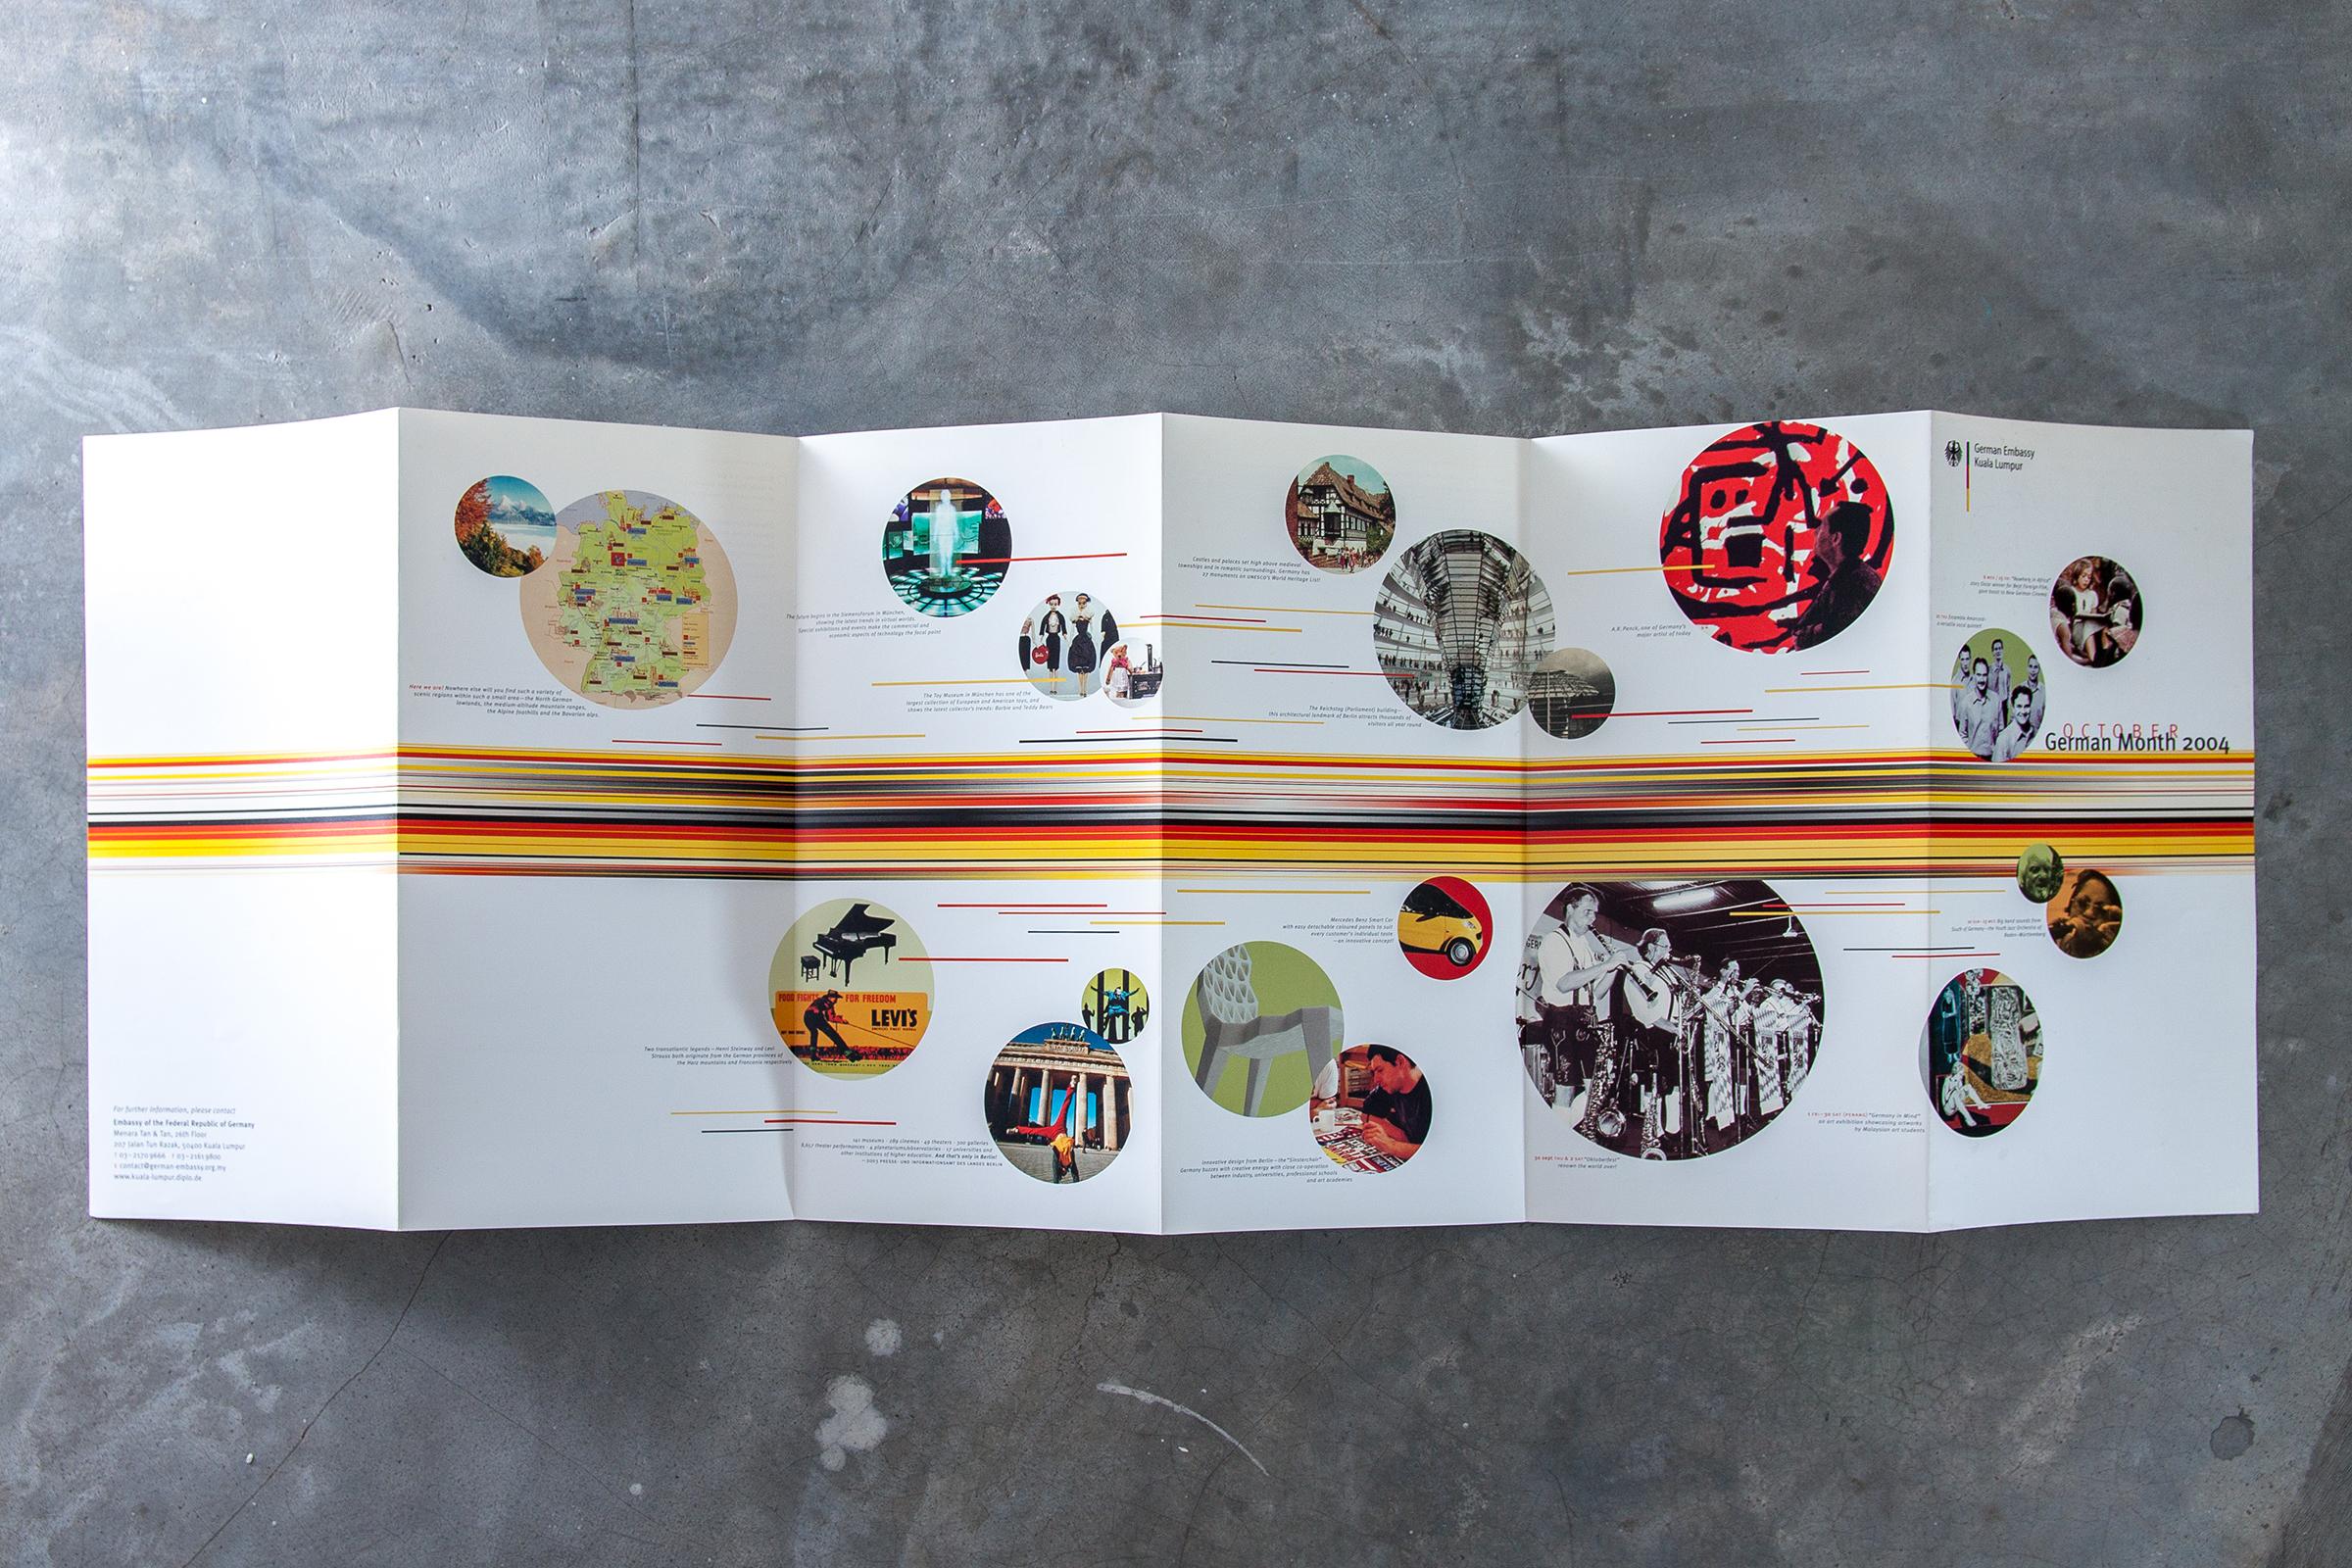 whwWeb_German Month_Leaflet_open_front_4446.jpg